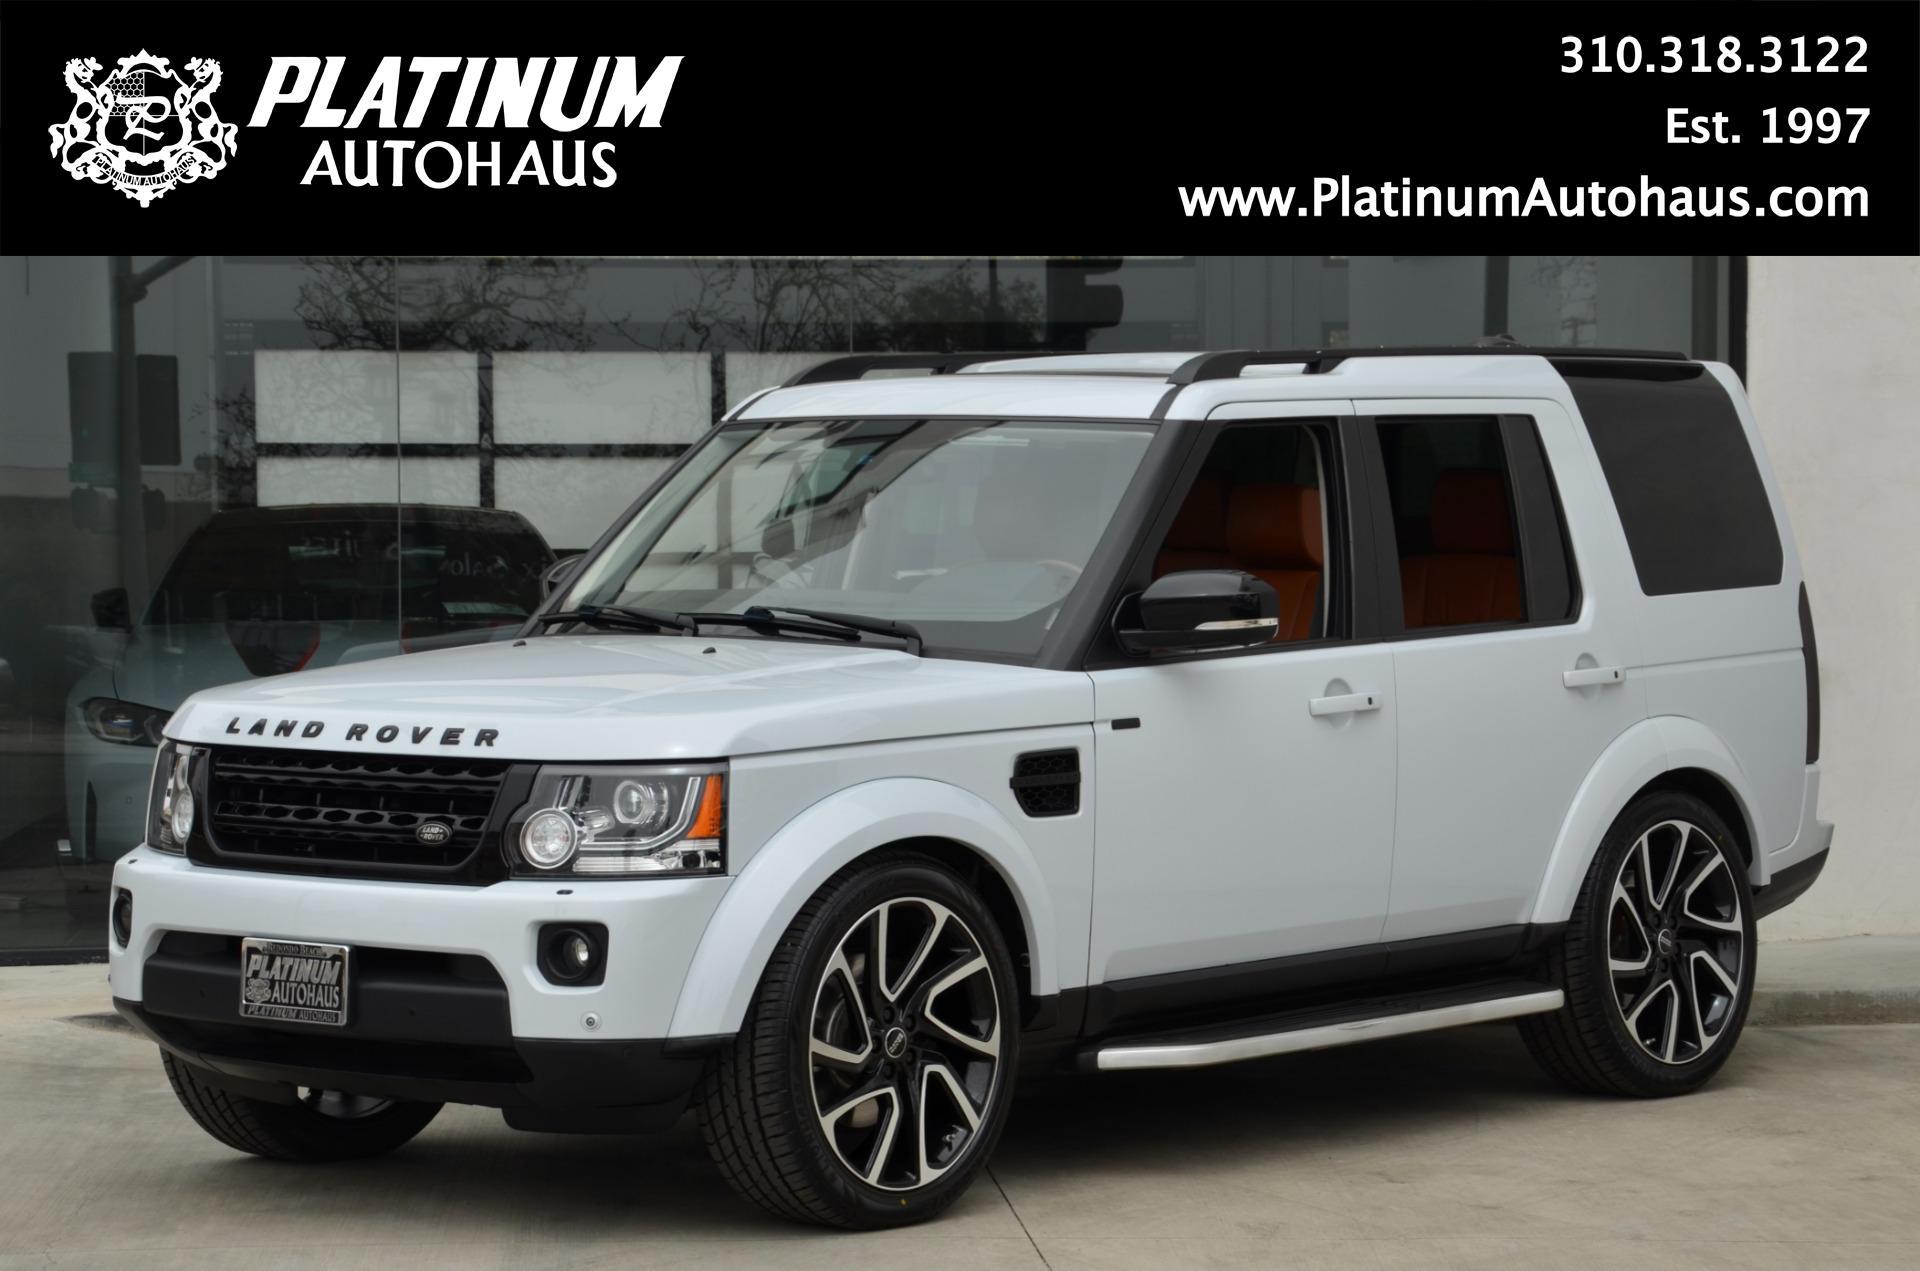 Used 2016 Land Rover Lr4 Hse Lux Landmark Edition